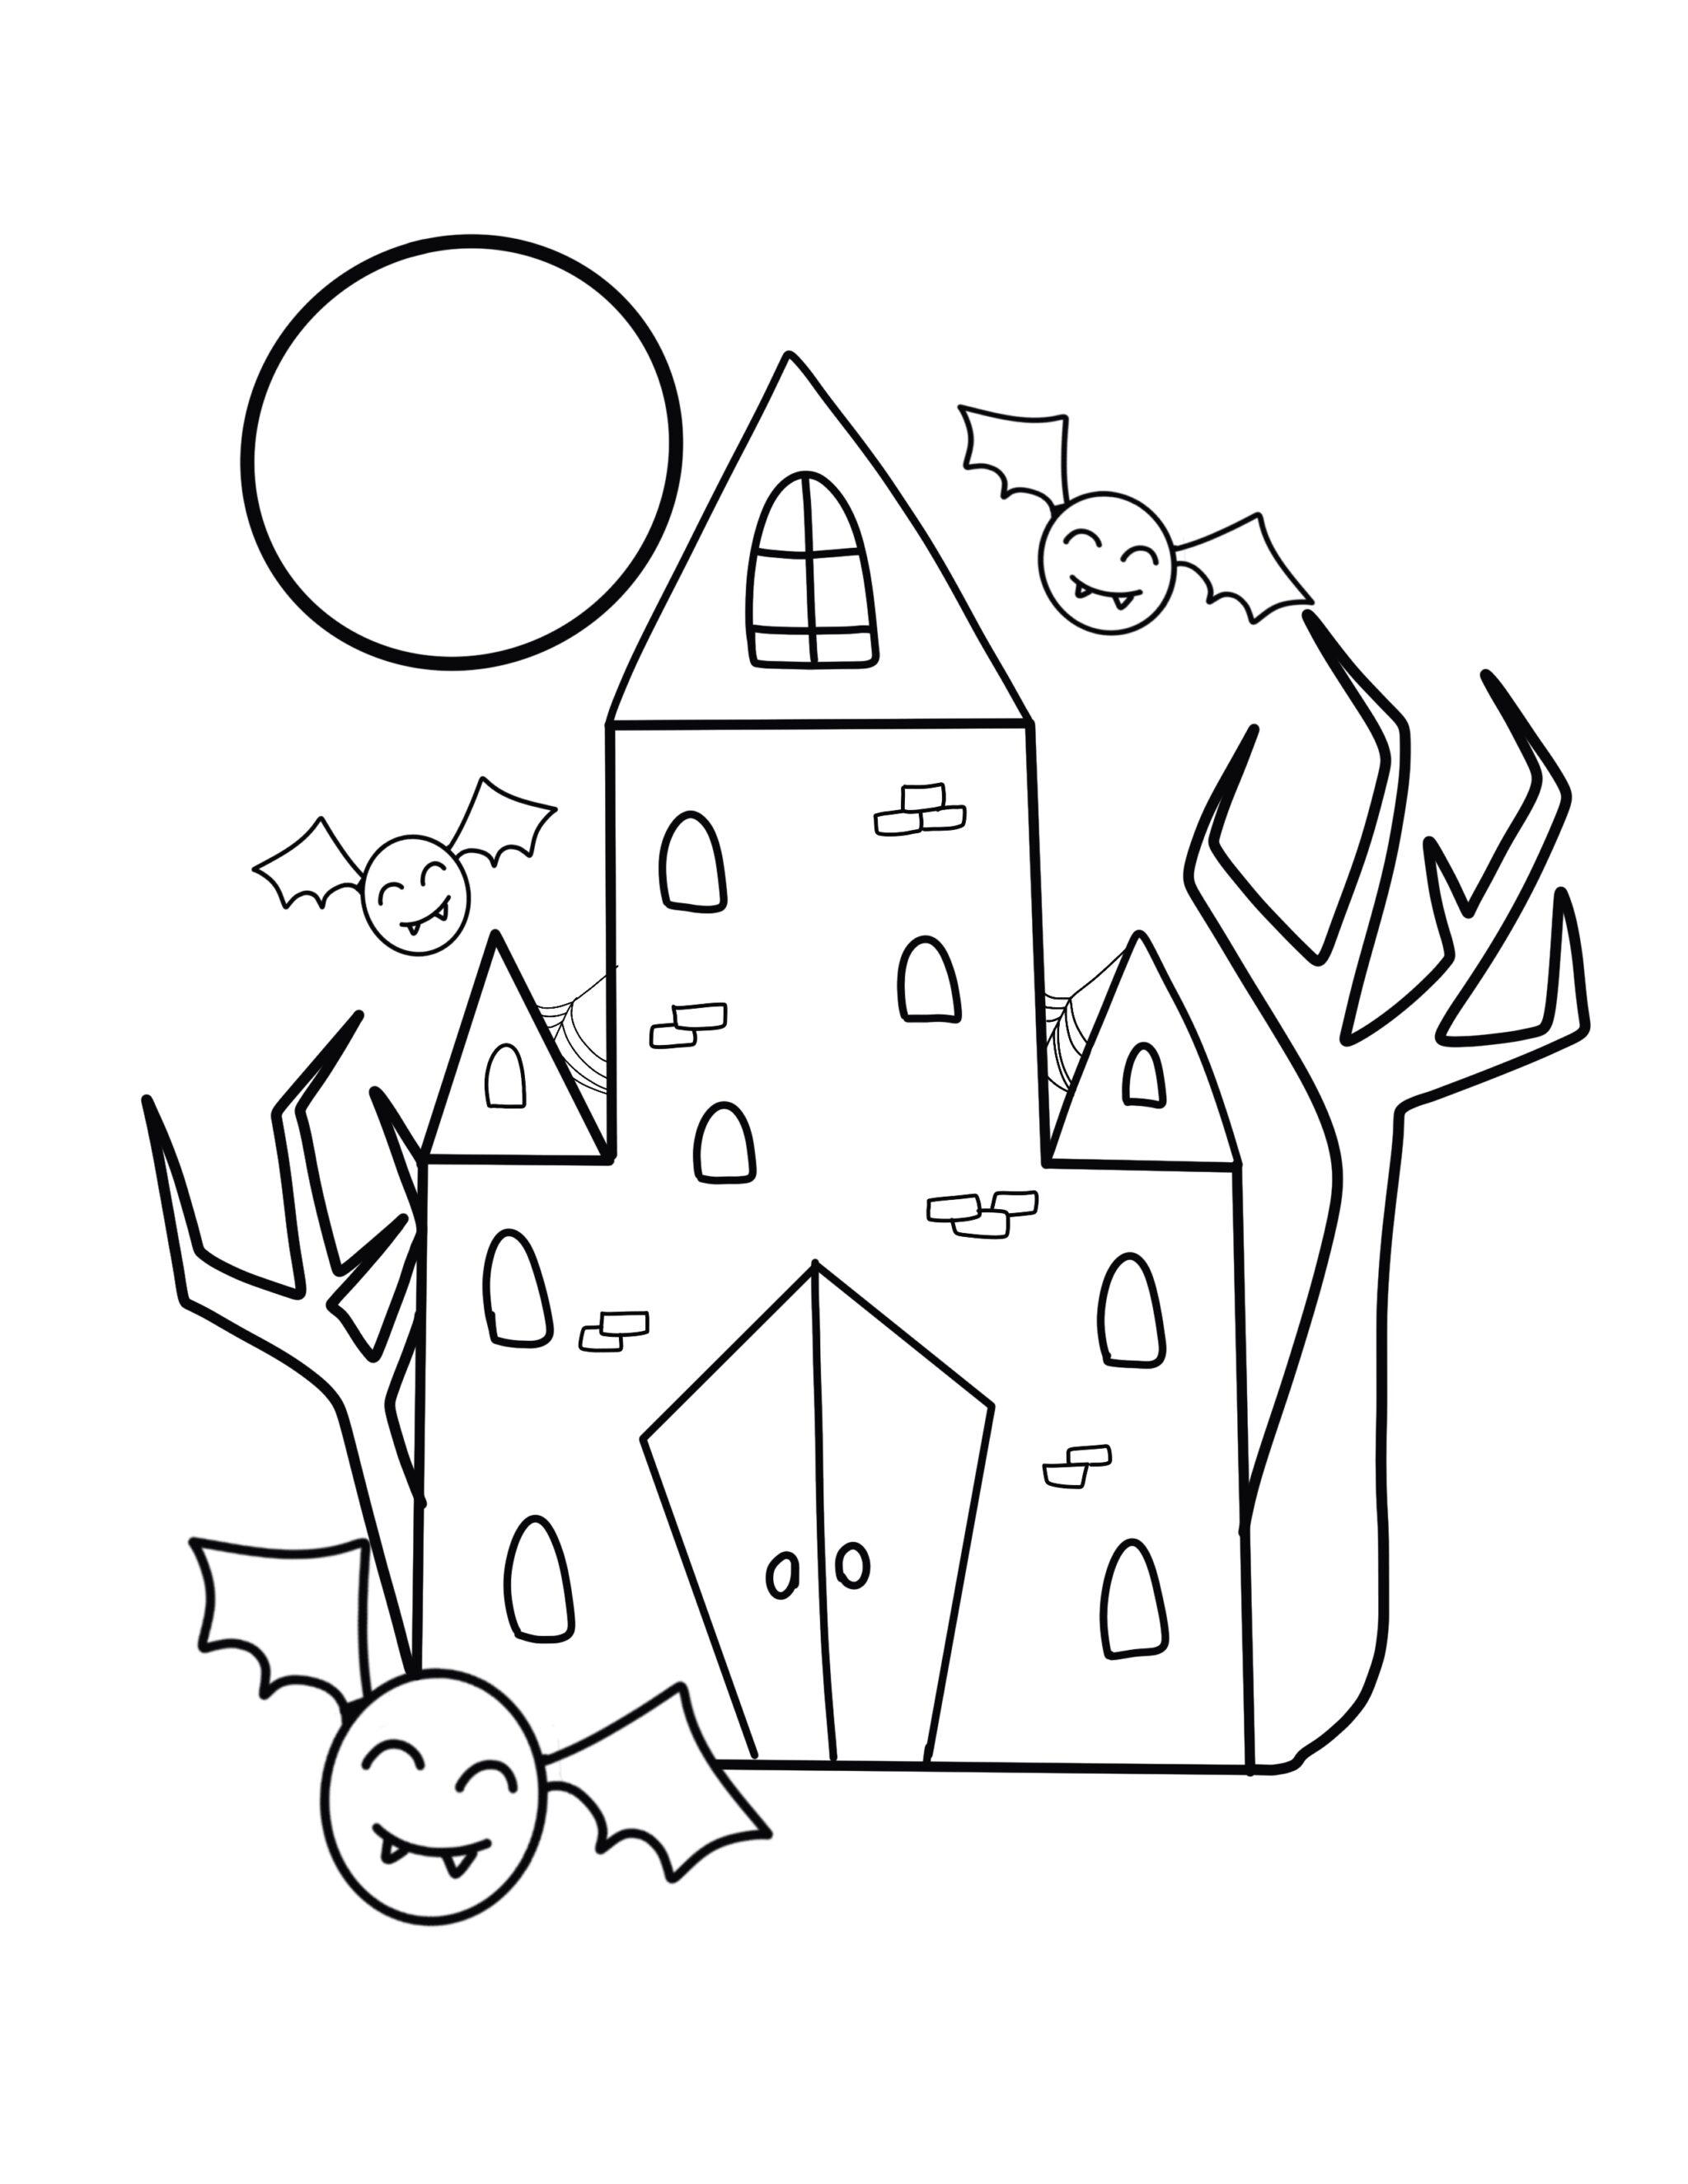 Coloringes Free Printable Halloween For Kids Easy Dinosaur ... | 2588x2000